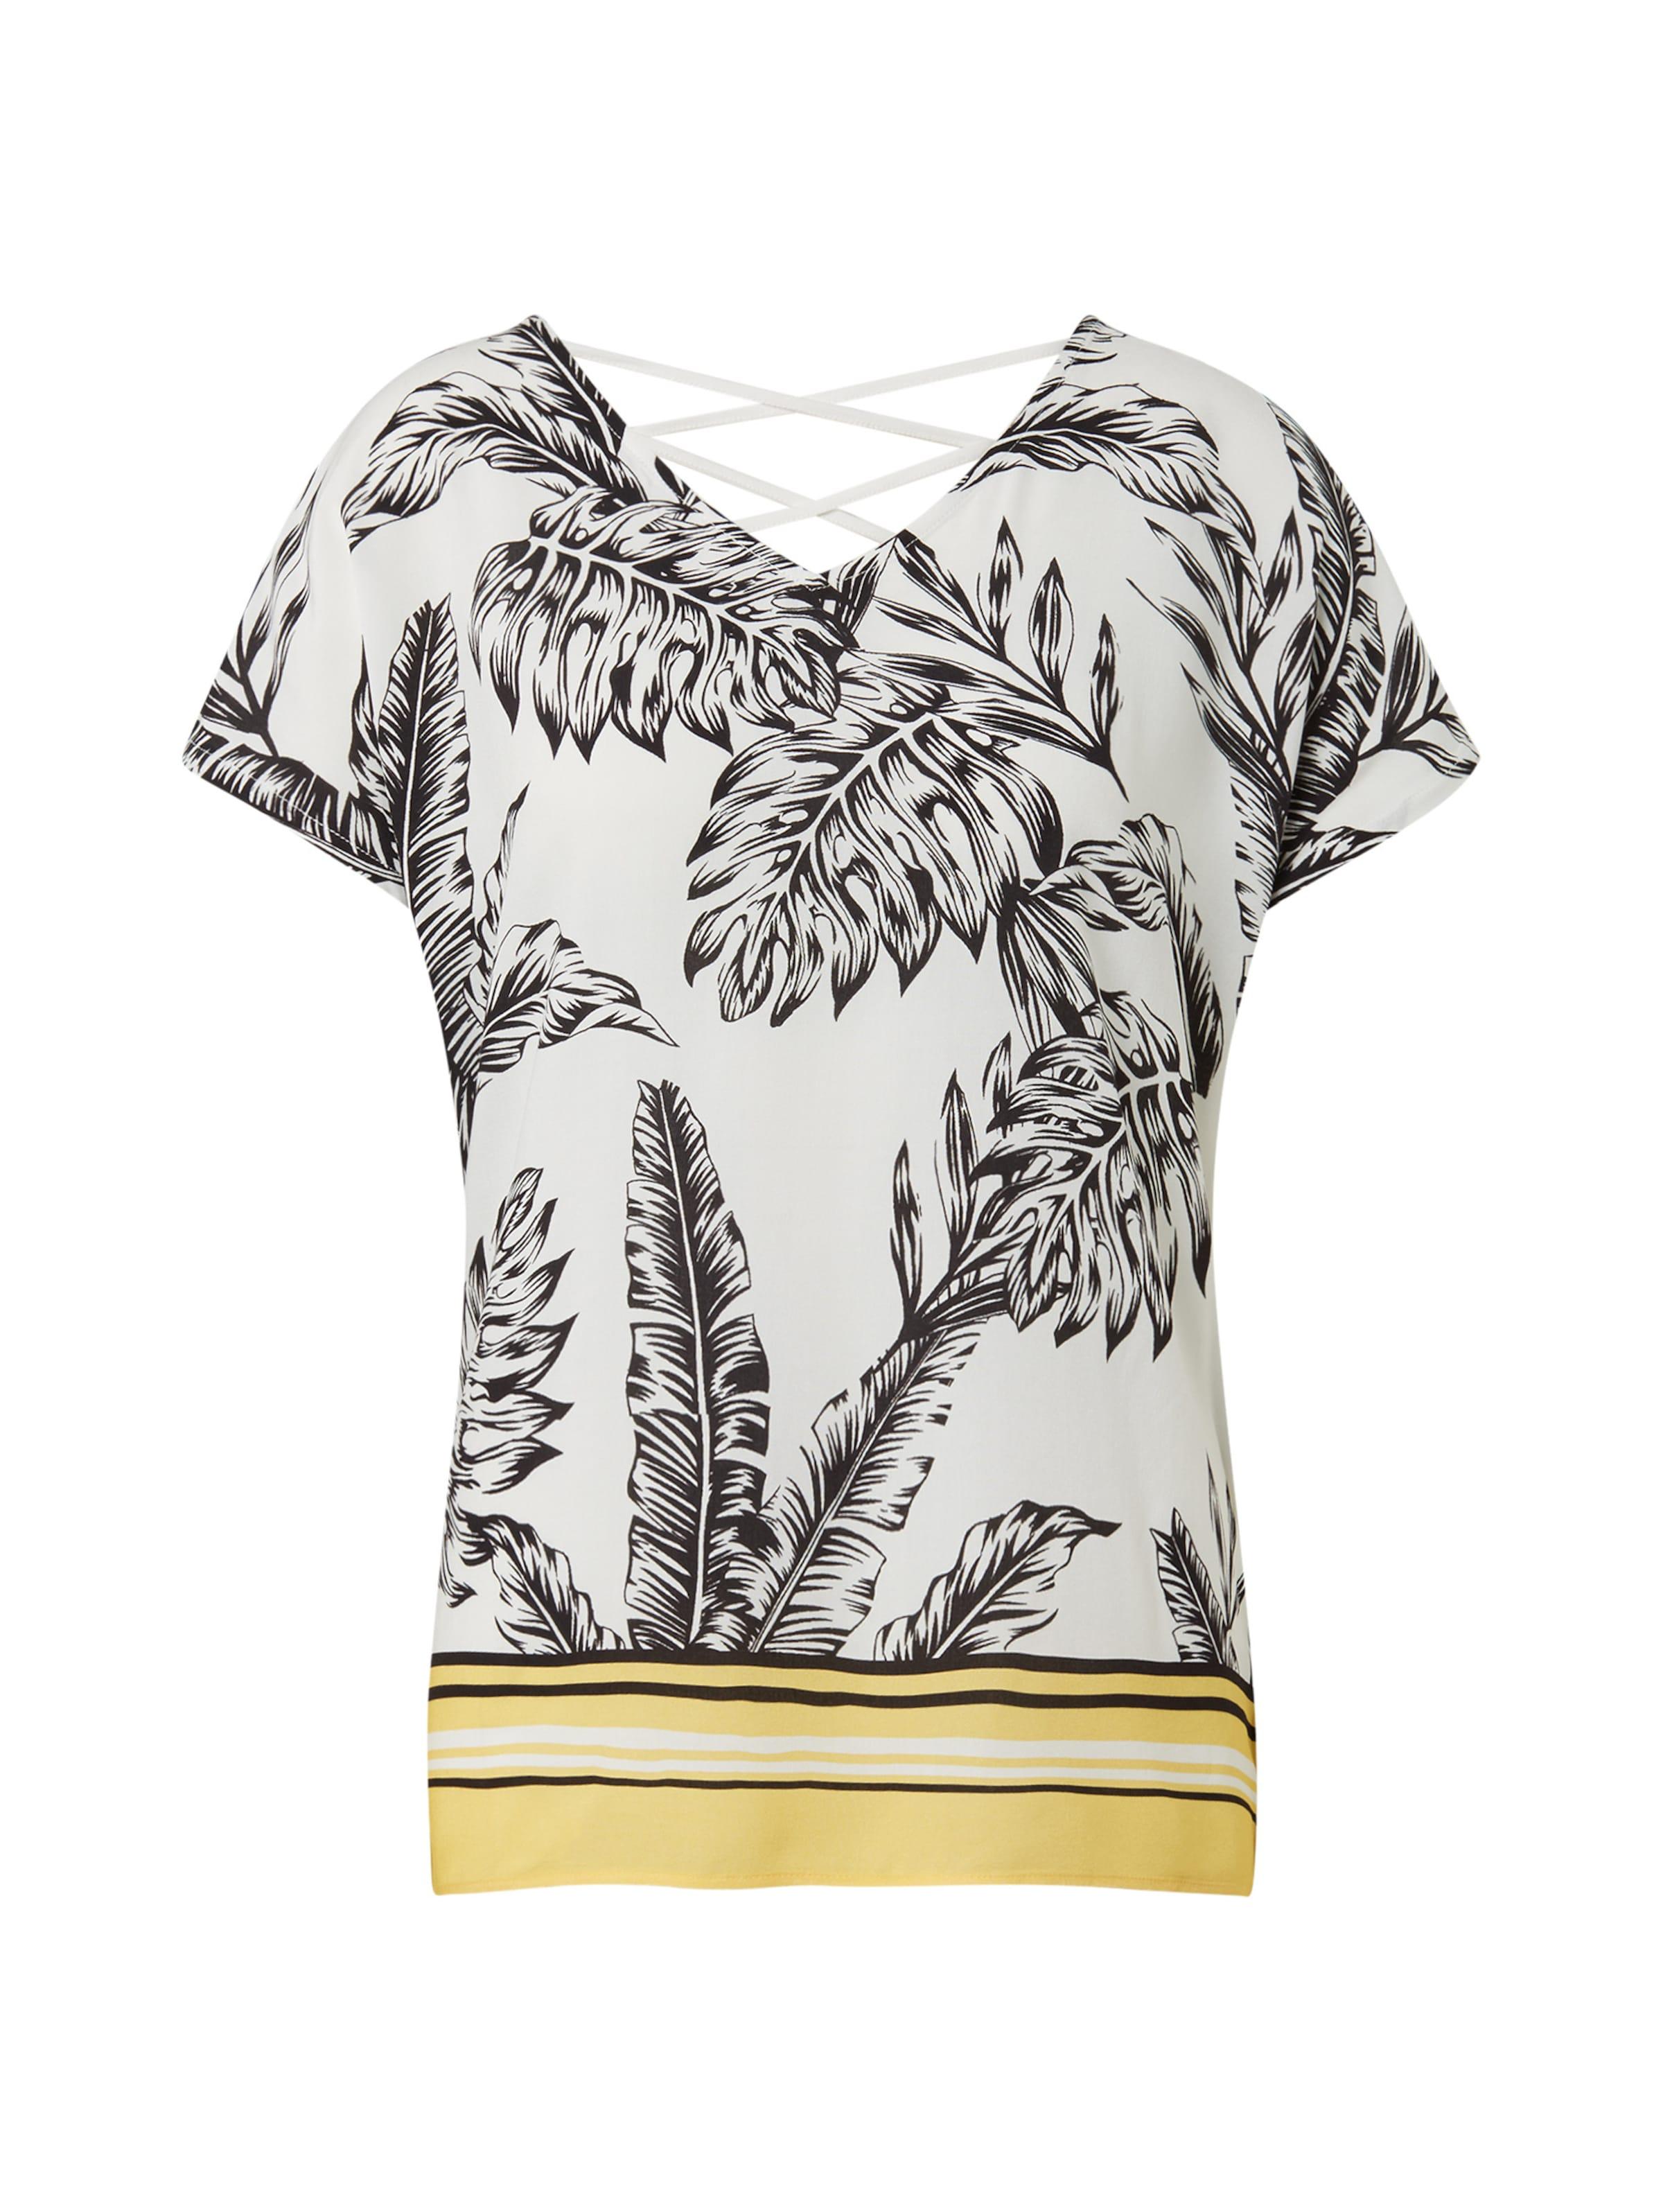 T shirt MischfarbenWeiß Tom In Tailor R3L5j4A